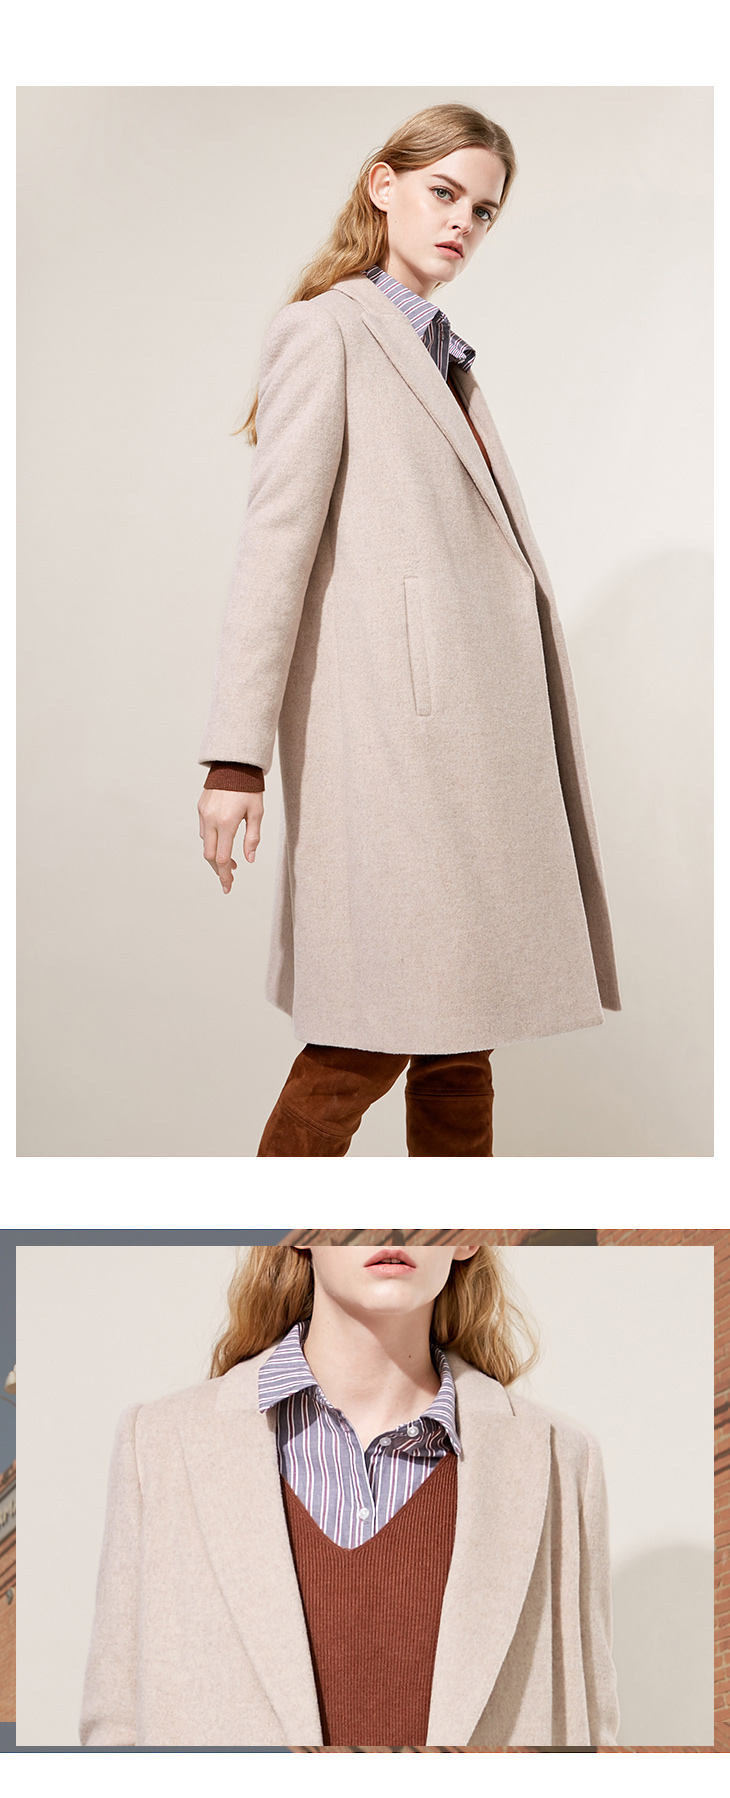 ONLY 19 Autumn Winter New Women Wool Coat Double-breasted Woolen Coat |118427502 20